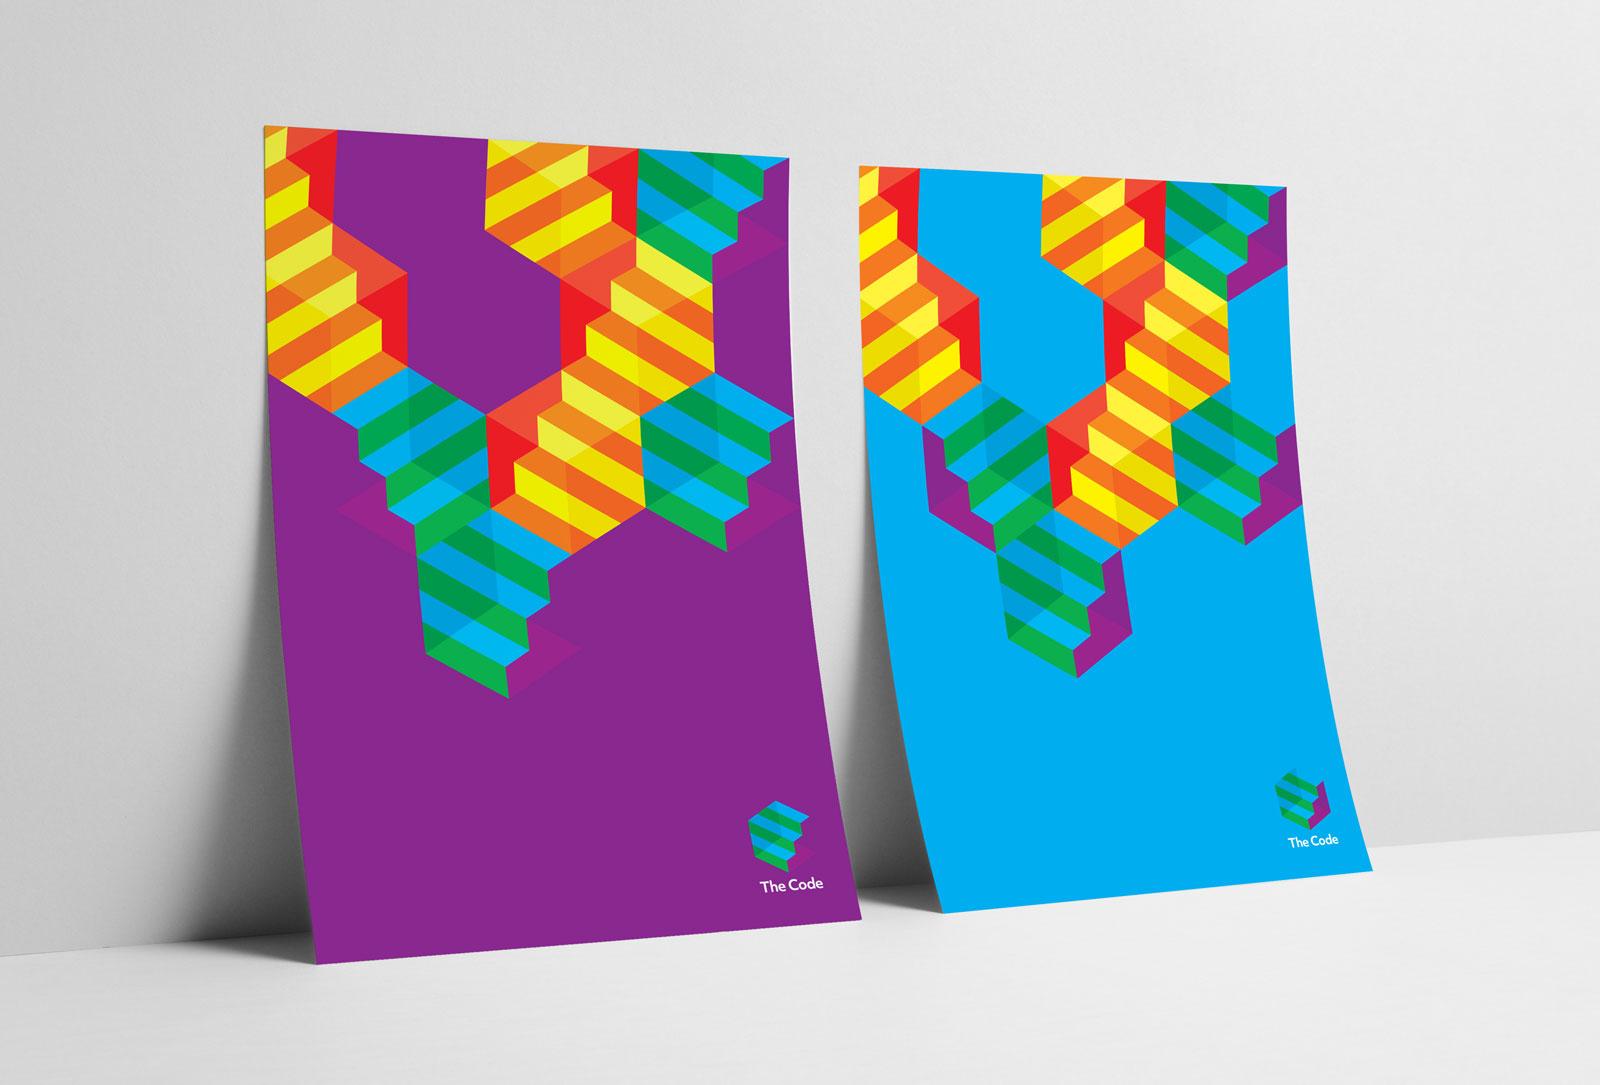 Recent identity design by Matt Comboy for 'The Code' for Dentsu Aegis